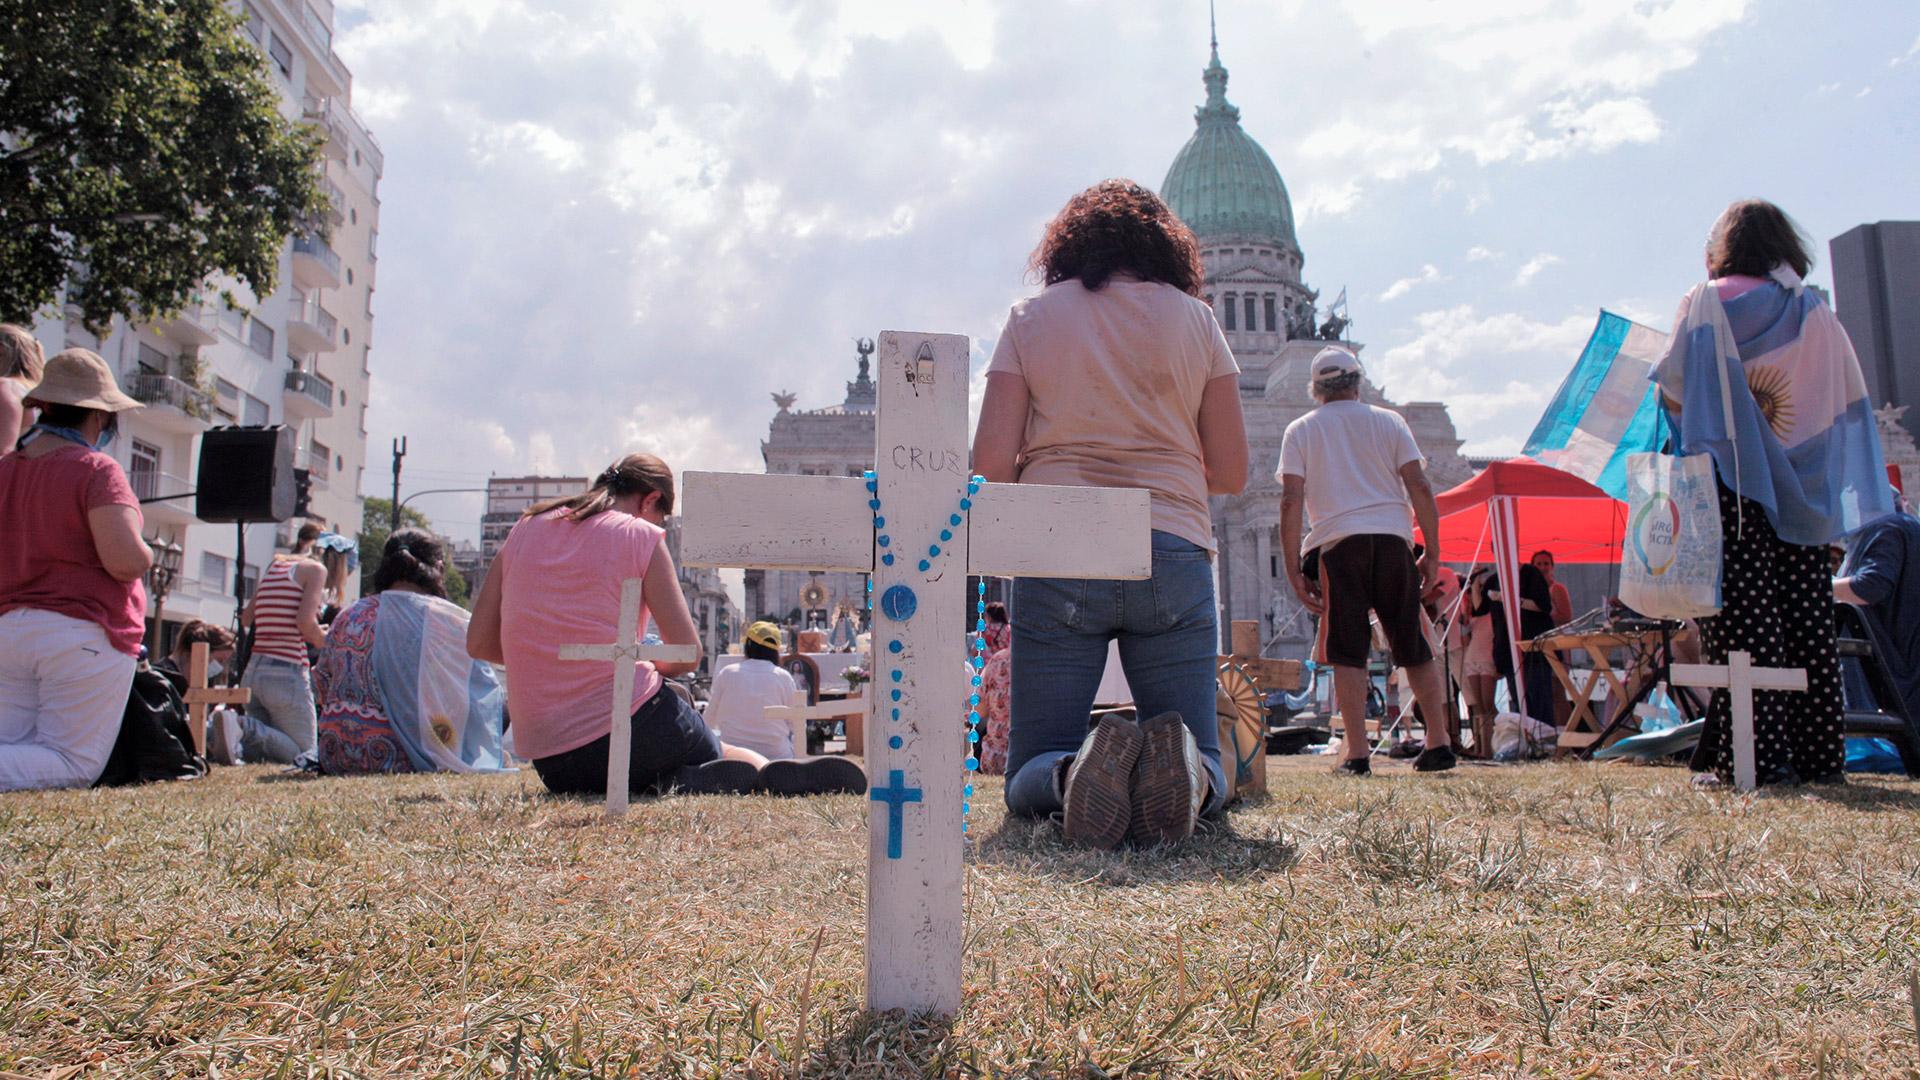 El papa Francisco y la cúpula de la Iglesia Católica argentina se manifestaron